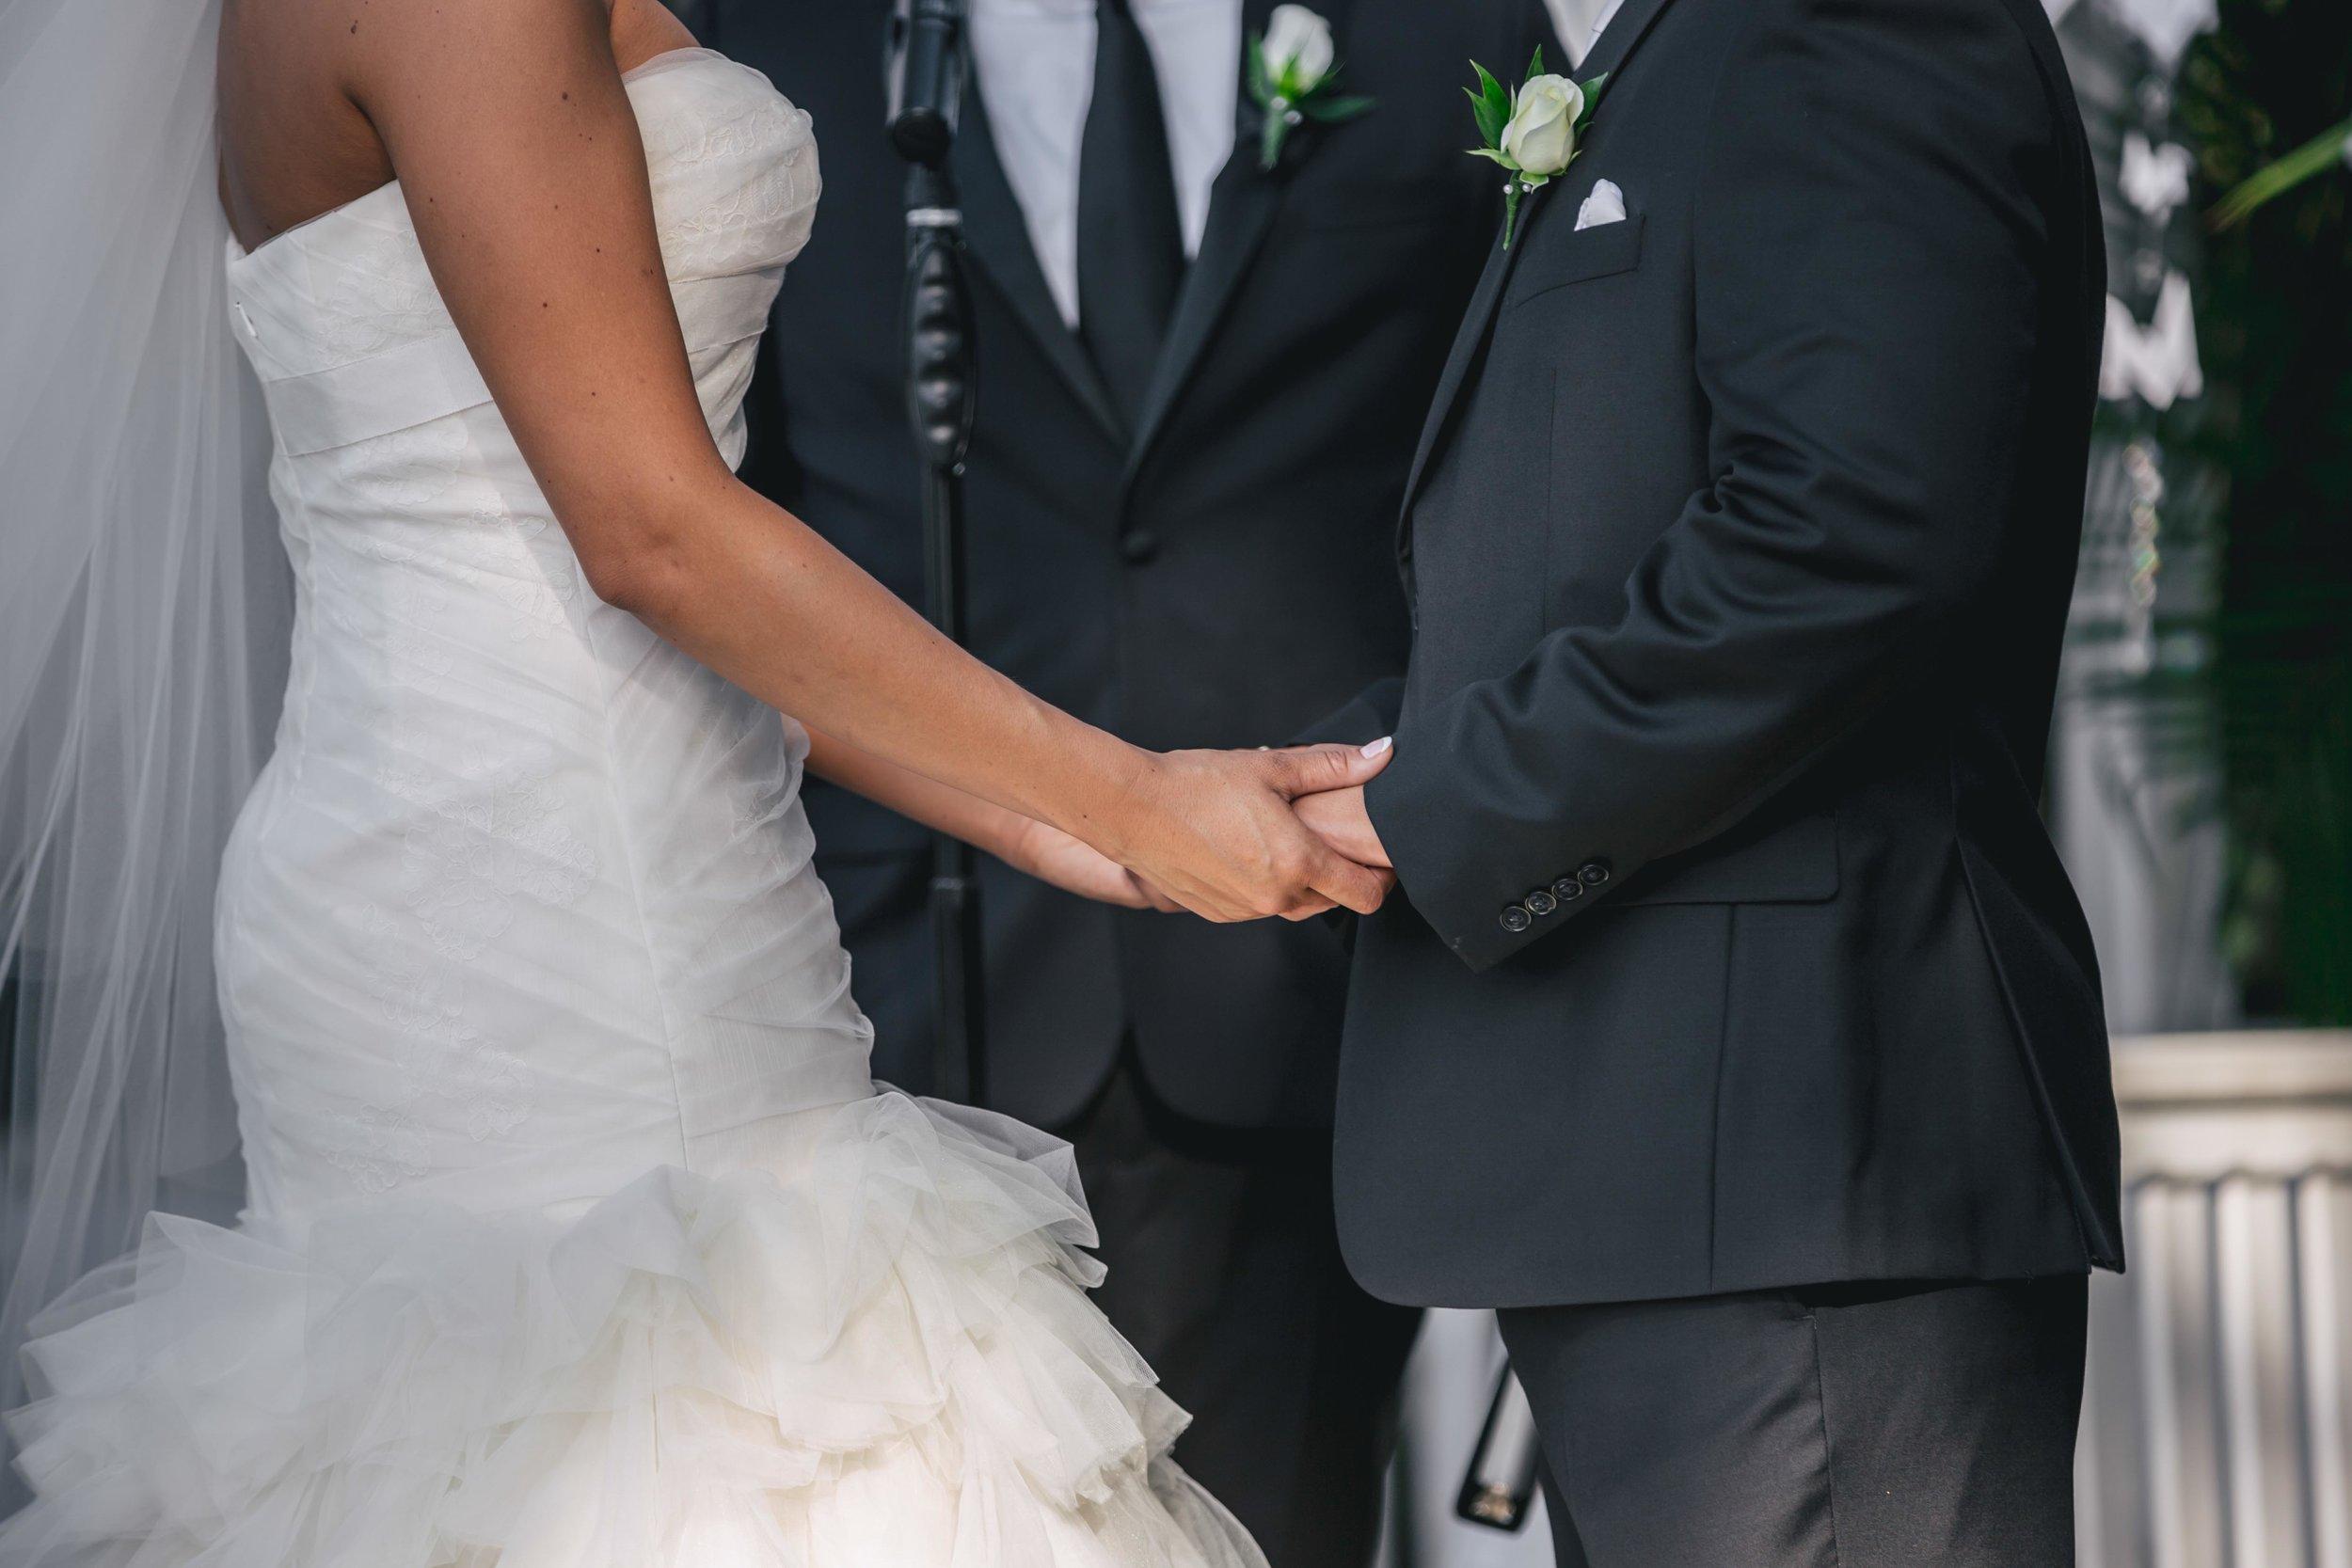 APavone-Photographer-Orange-County-Diamond-Bar-Wedding-055.jpg